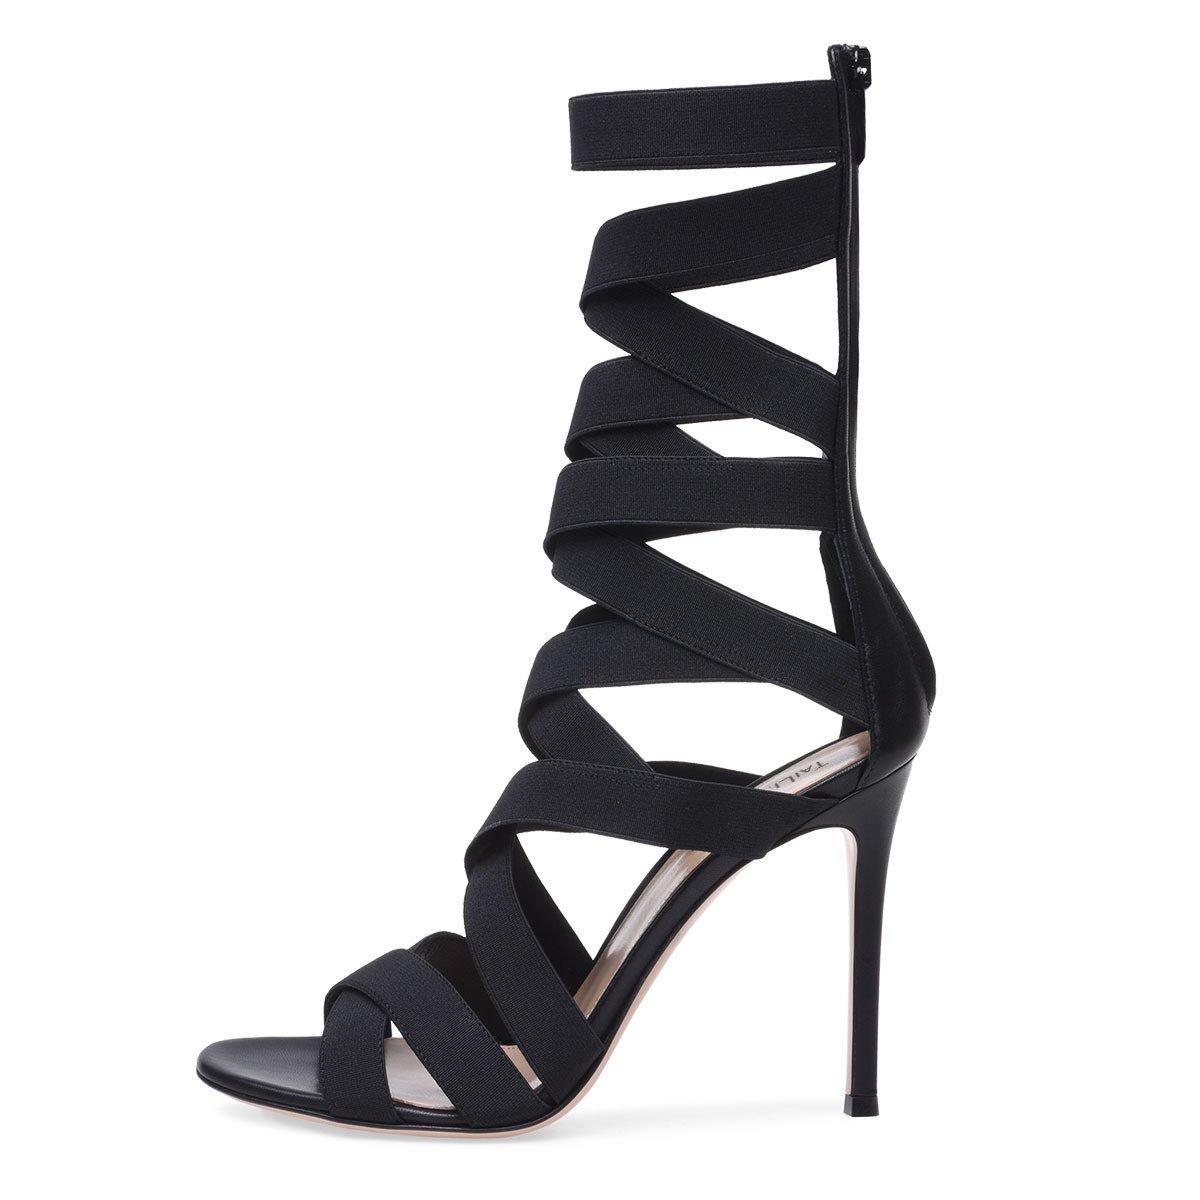 XIE Damen Stilettsandalen Absatzschuhe Plattform Peep Toe Toe Toe Knöchel Schwarz Sandale Stiefel mit Reißverschluss für Party Abend Hochzeit  728e4d